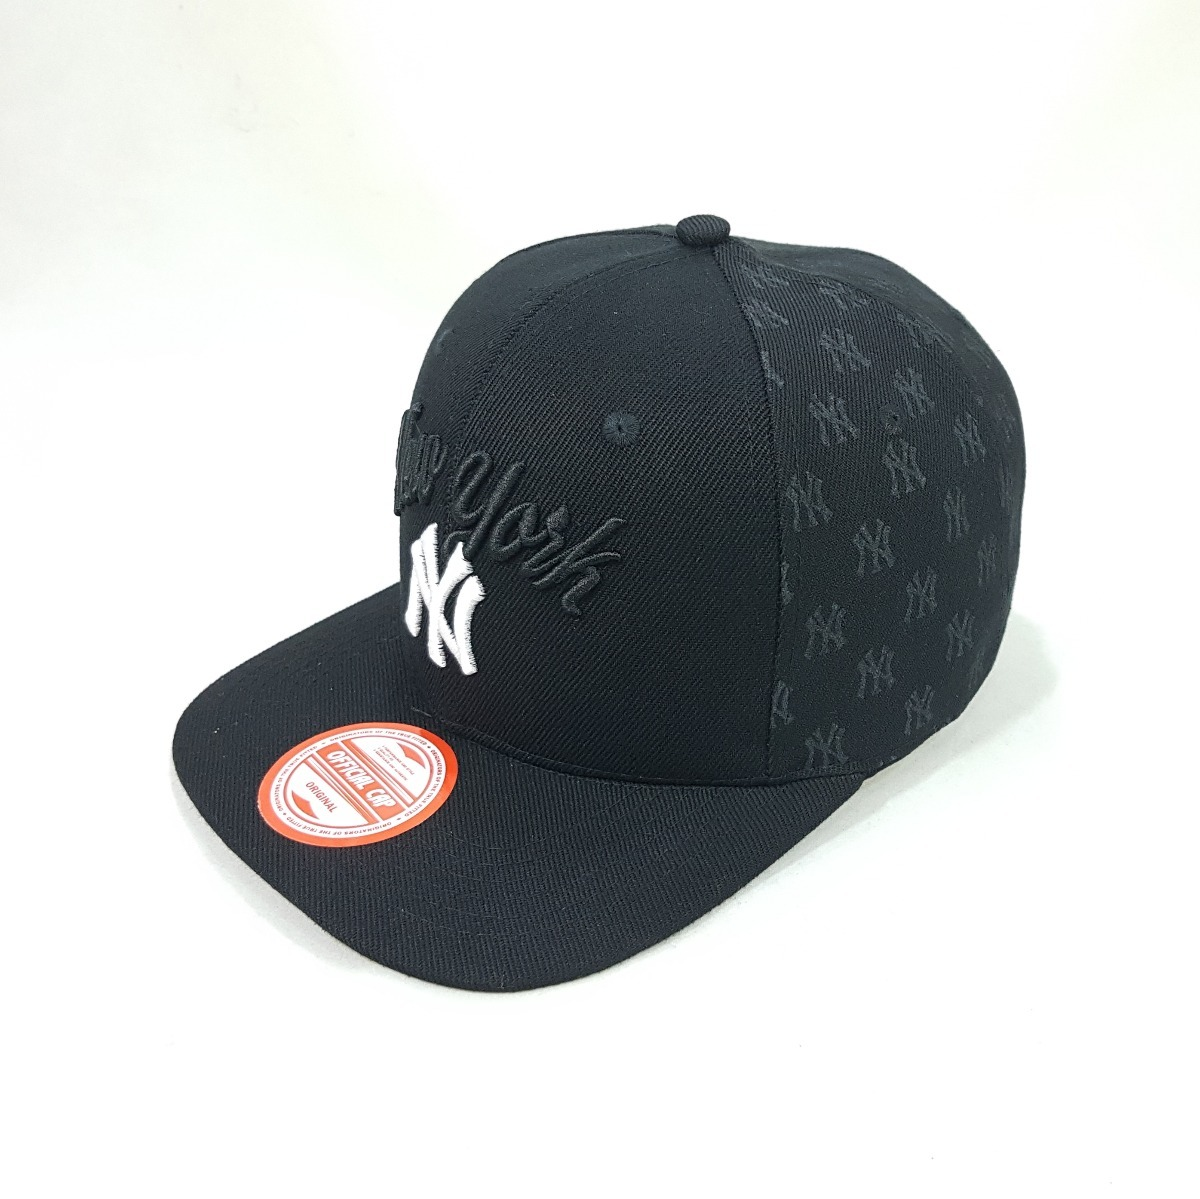 Carregando zoom... boné aba reta snapback ny new york yankees baseball preto  ... 4318ec9b0f8